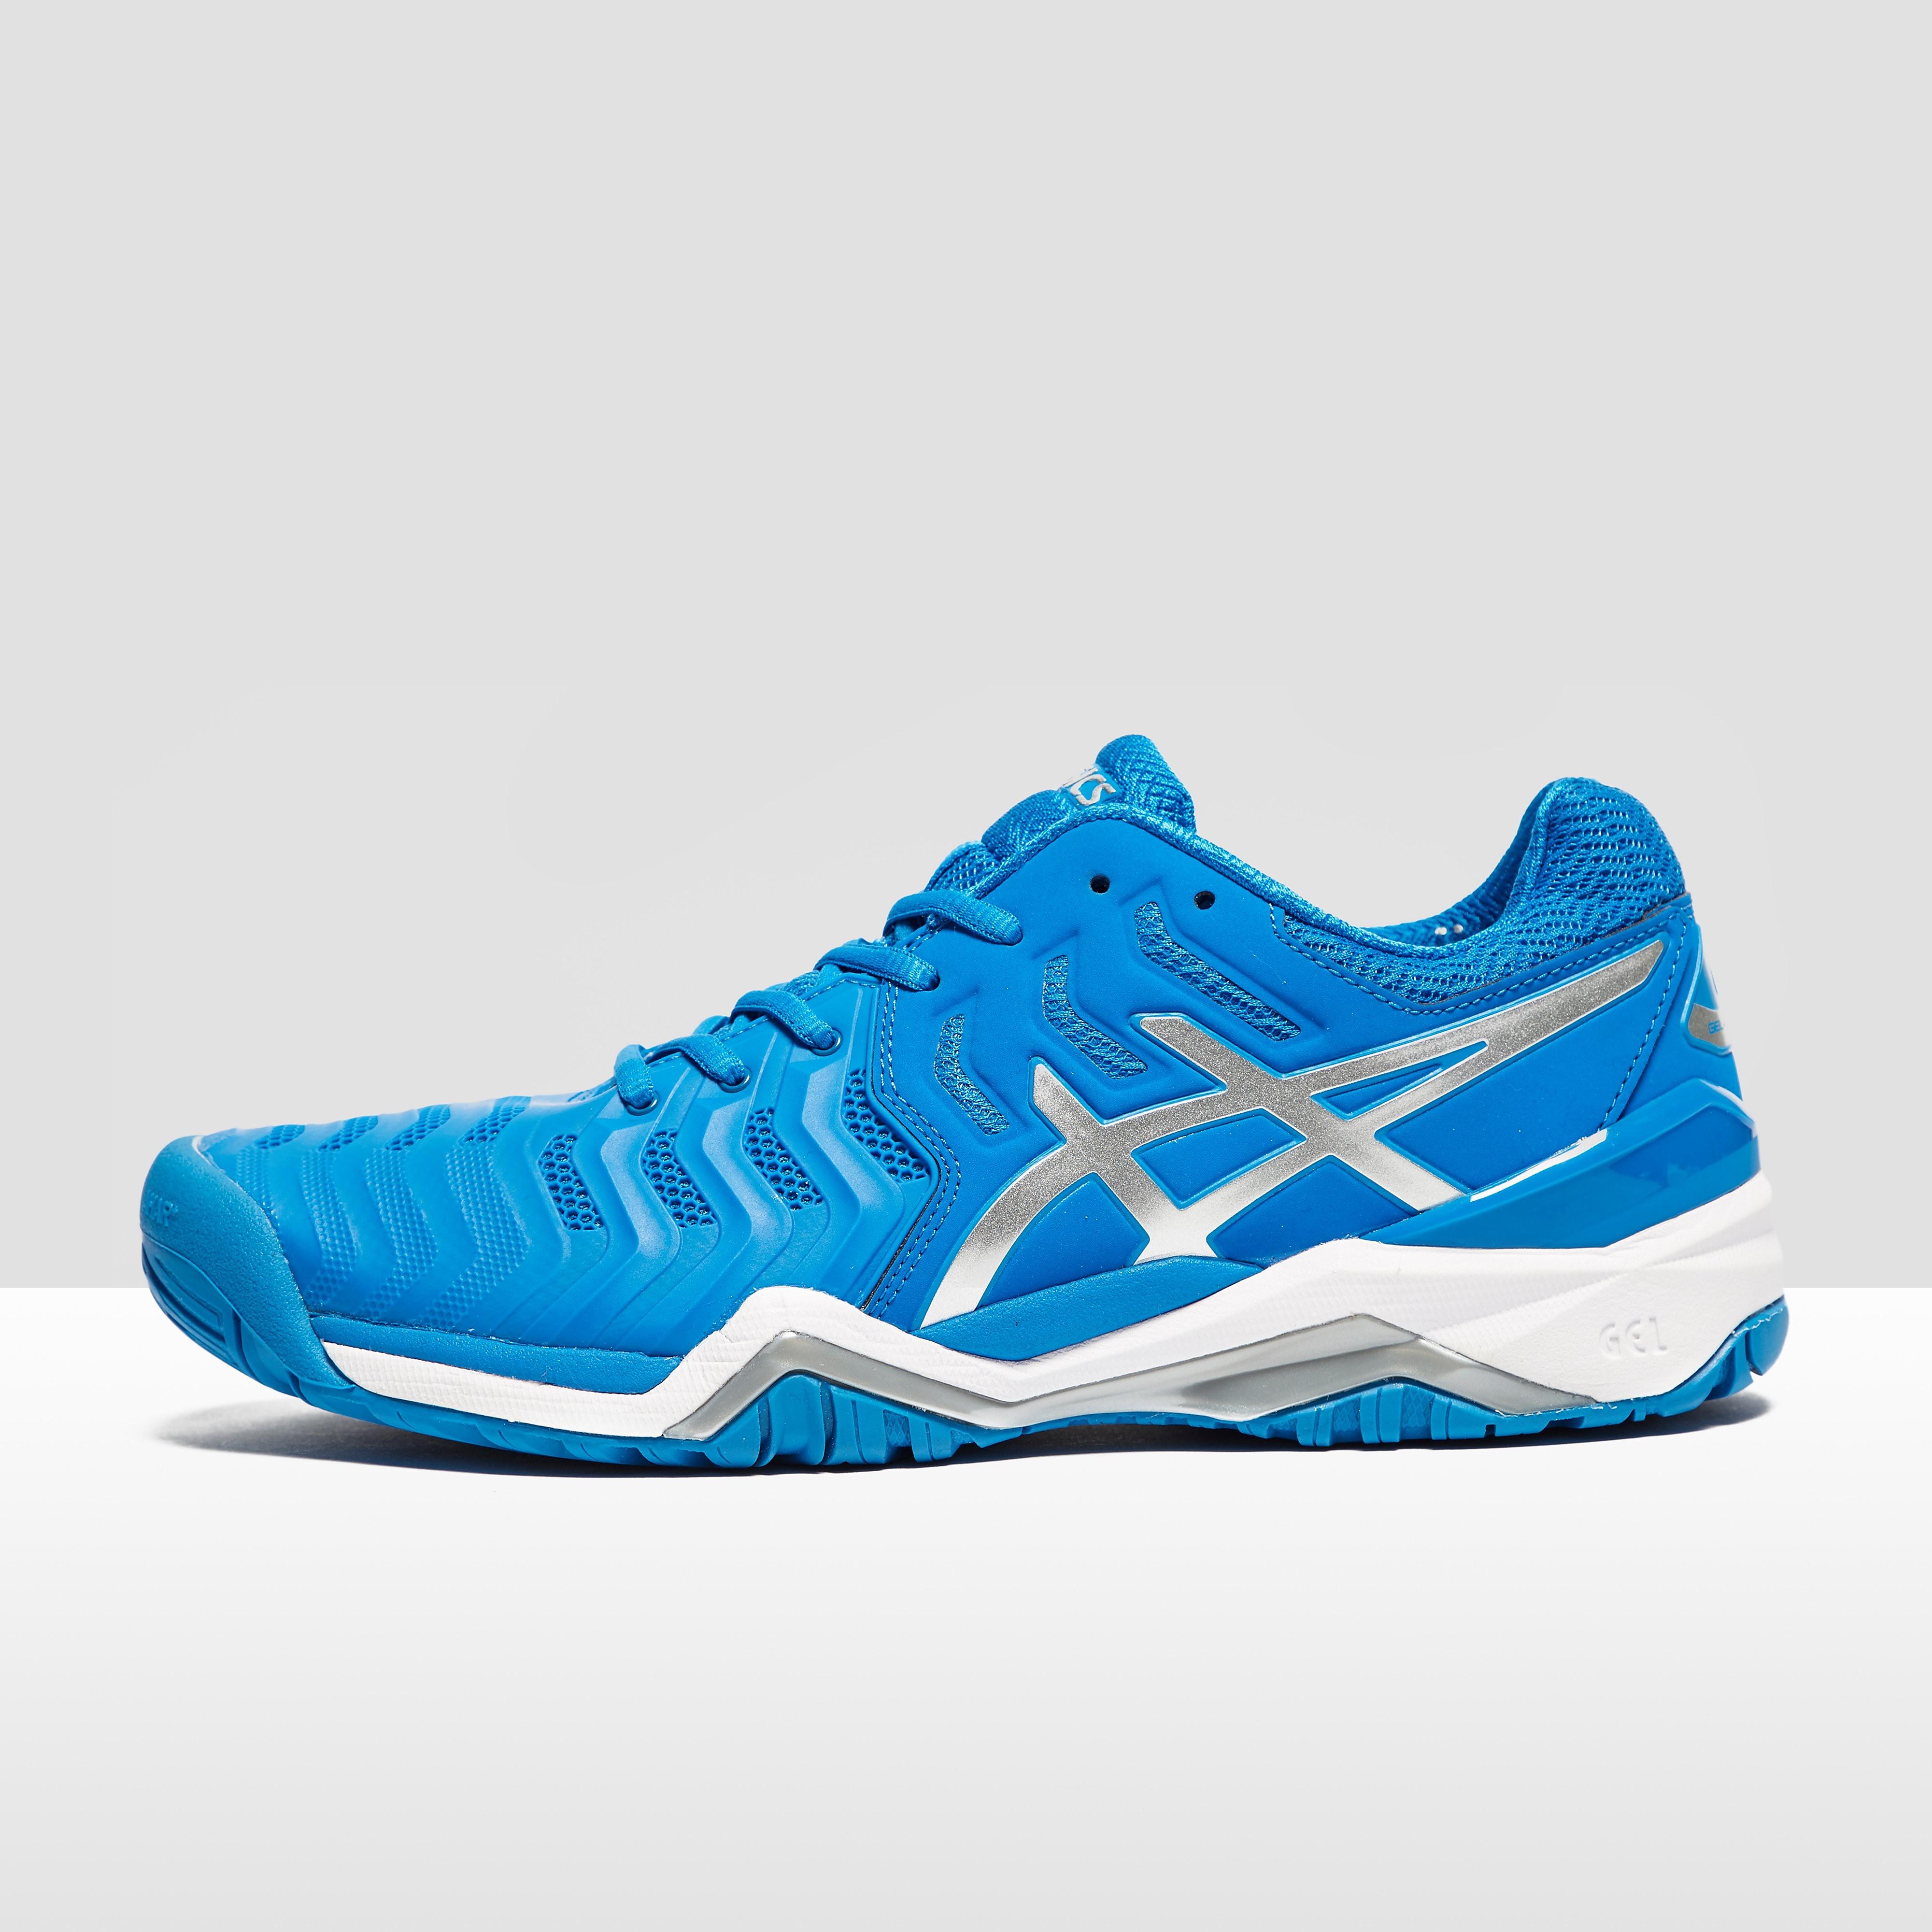 ASICS Men's Gel Resolution 7 Tennis Shoes